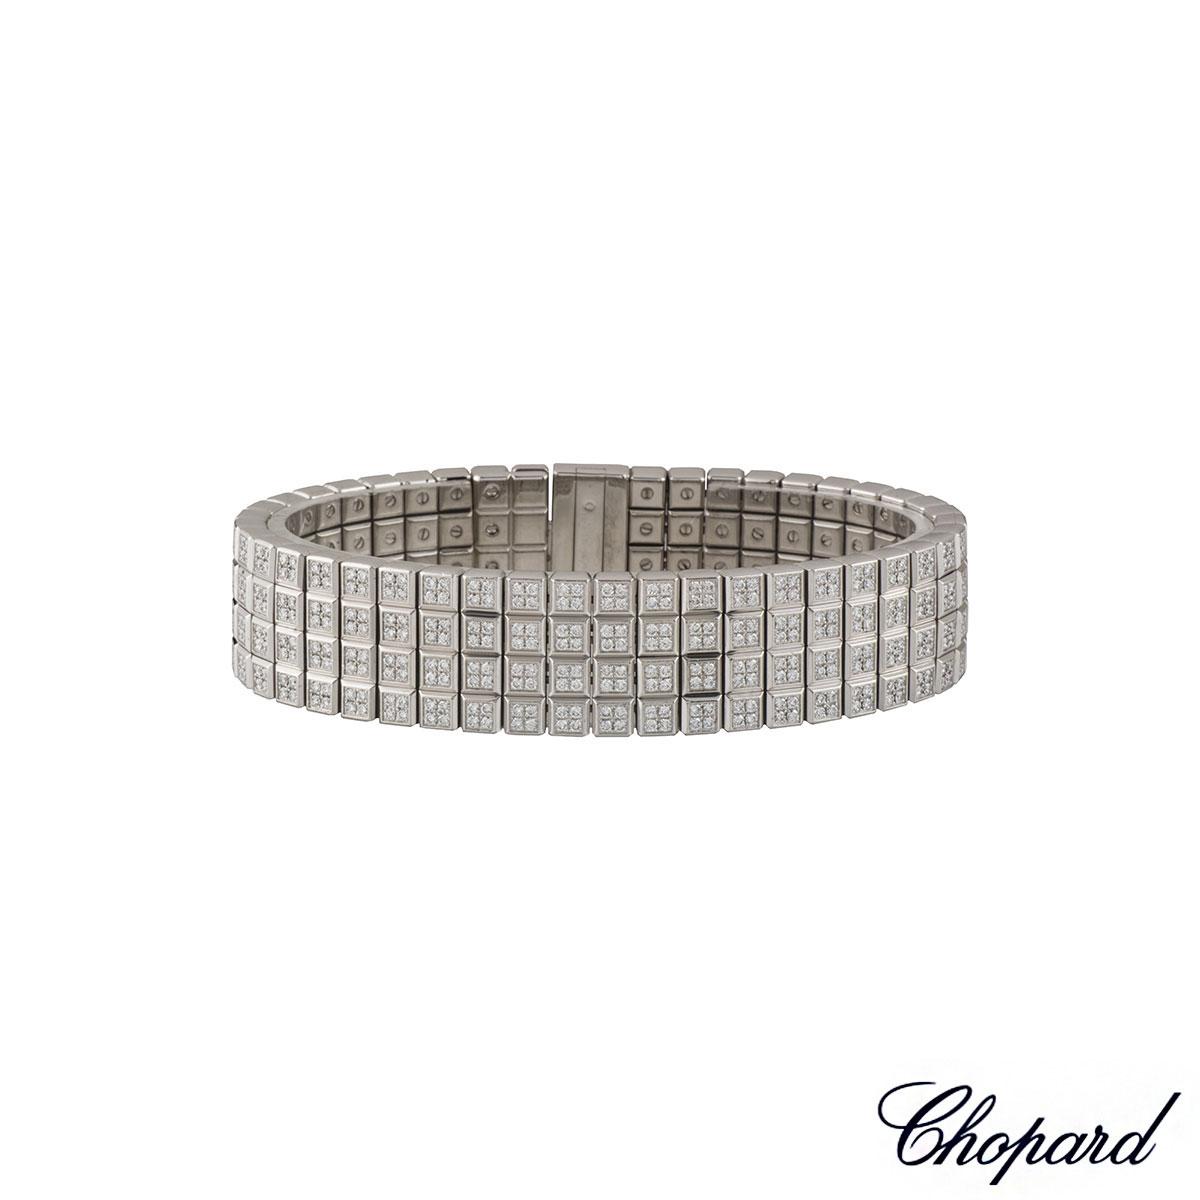 Chopard Ice Cube Diamond Bracelet in 18K Yellow Gold 9PdlIzFd